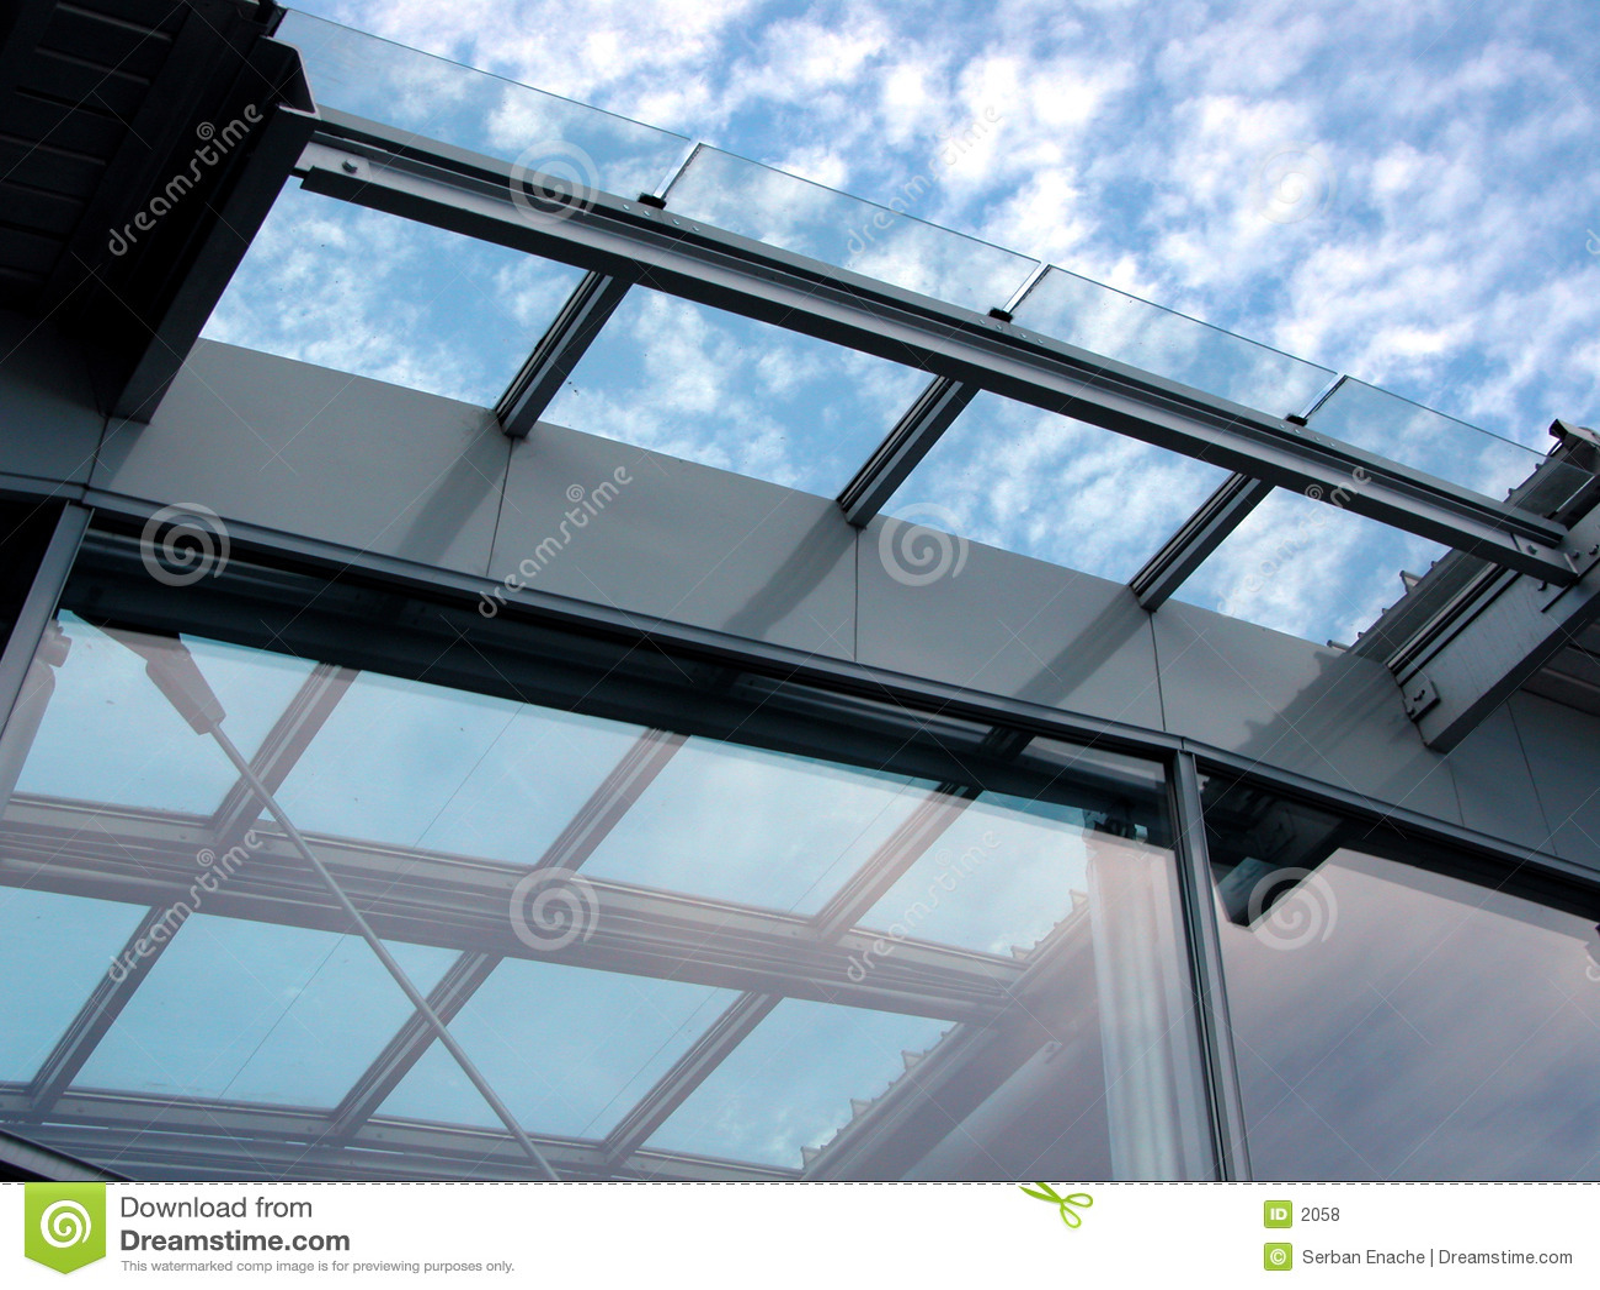 Windows to the future